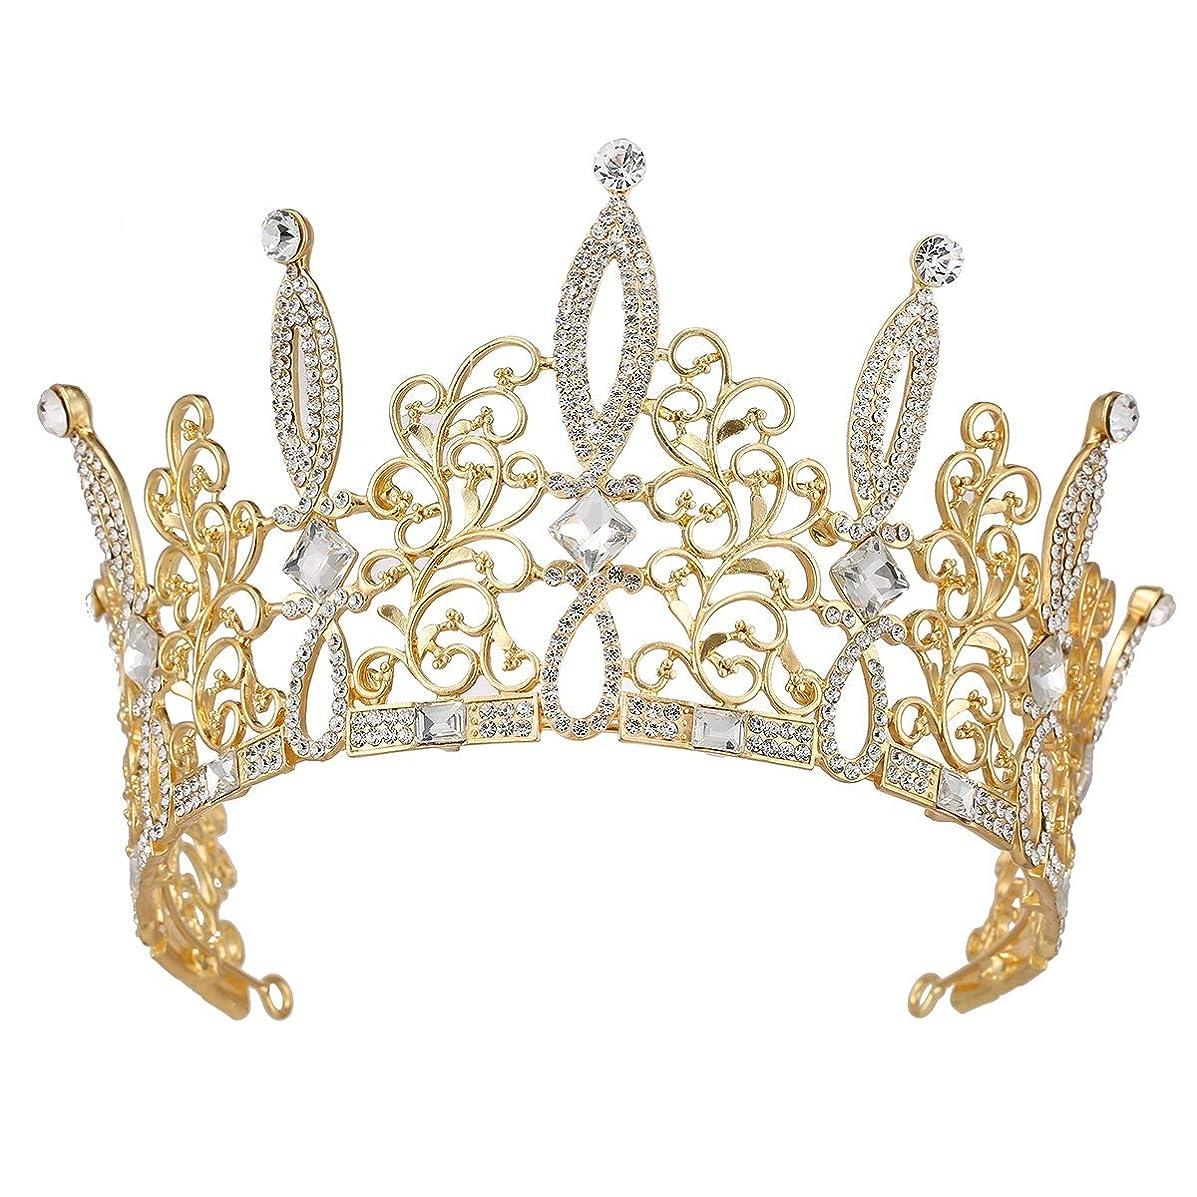 Santfe Rhinestones Crystal Tree Leaf Style Bridal Tiara Crown Headband Prom Wedding Hair Jewelry